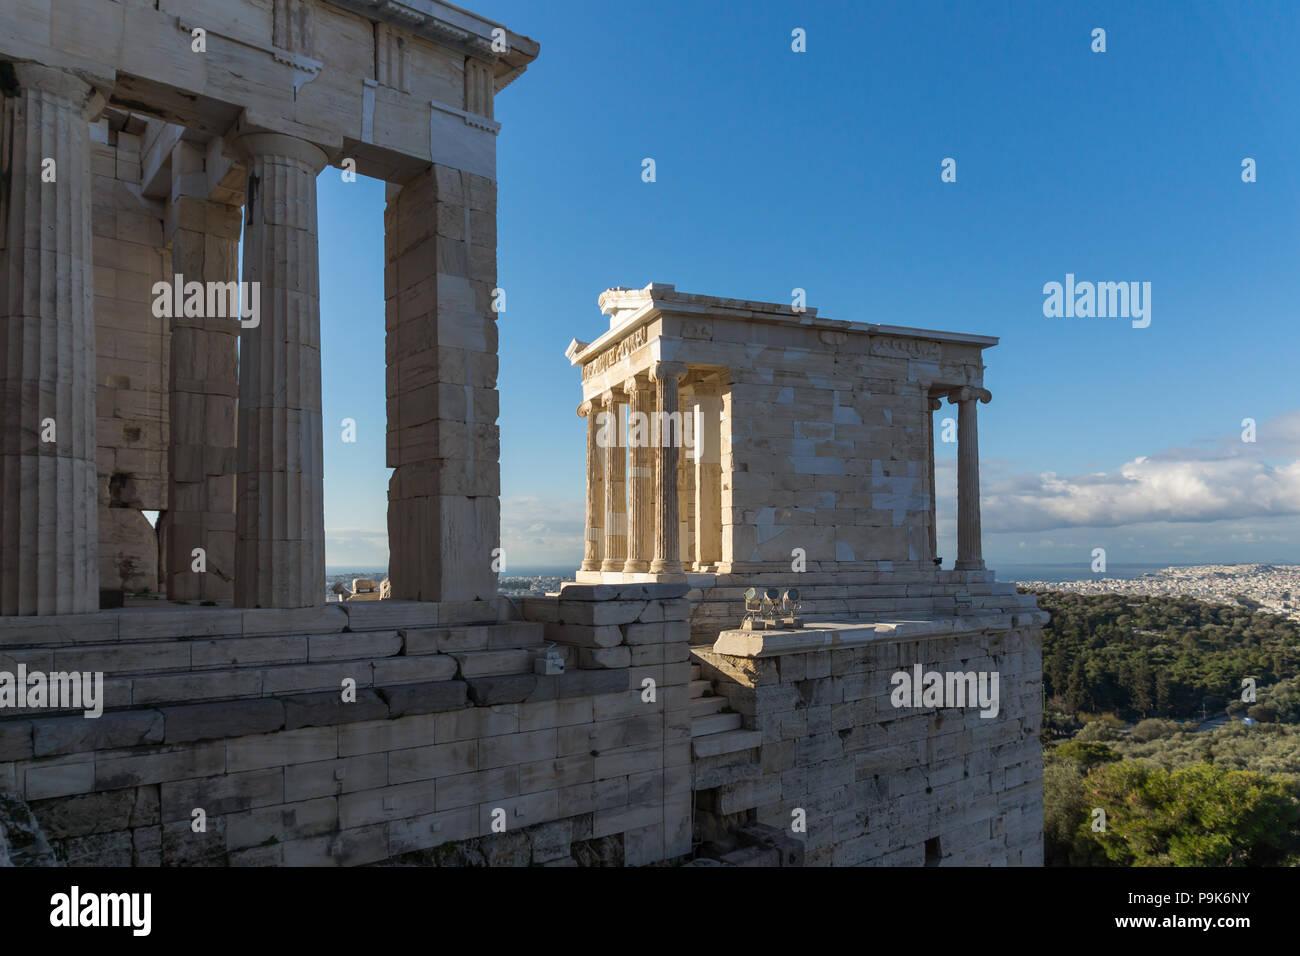 Monumental gateway Propylaea in the Acropolis of Athens, Attica, Greece - Stock Image